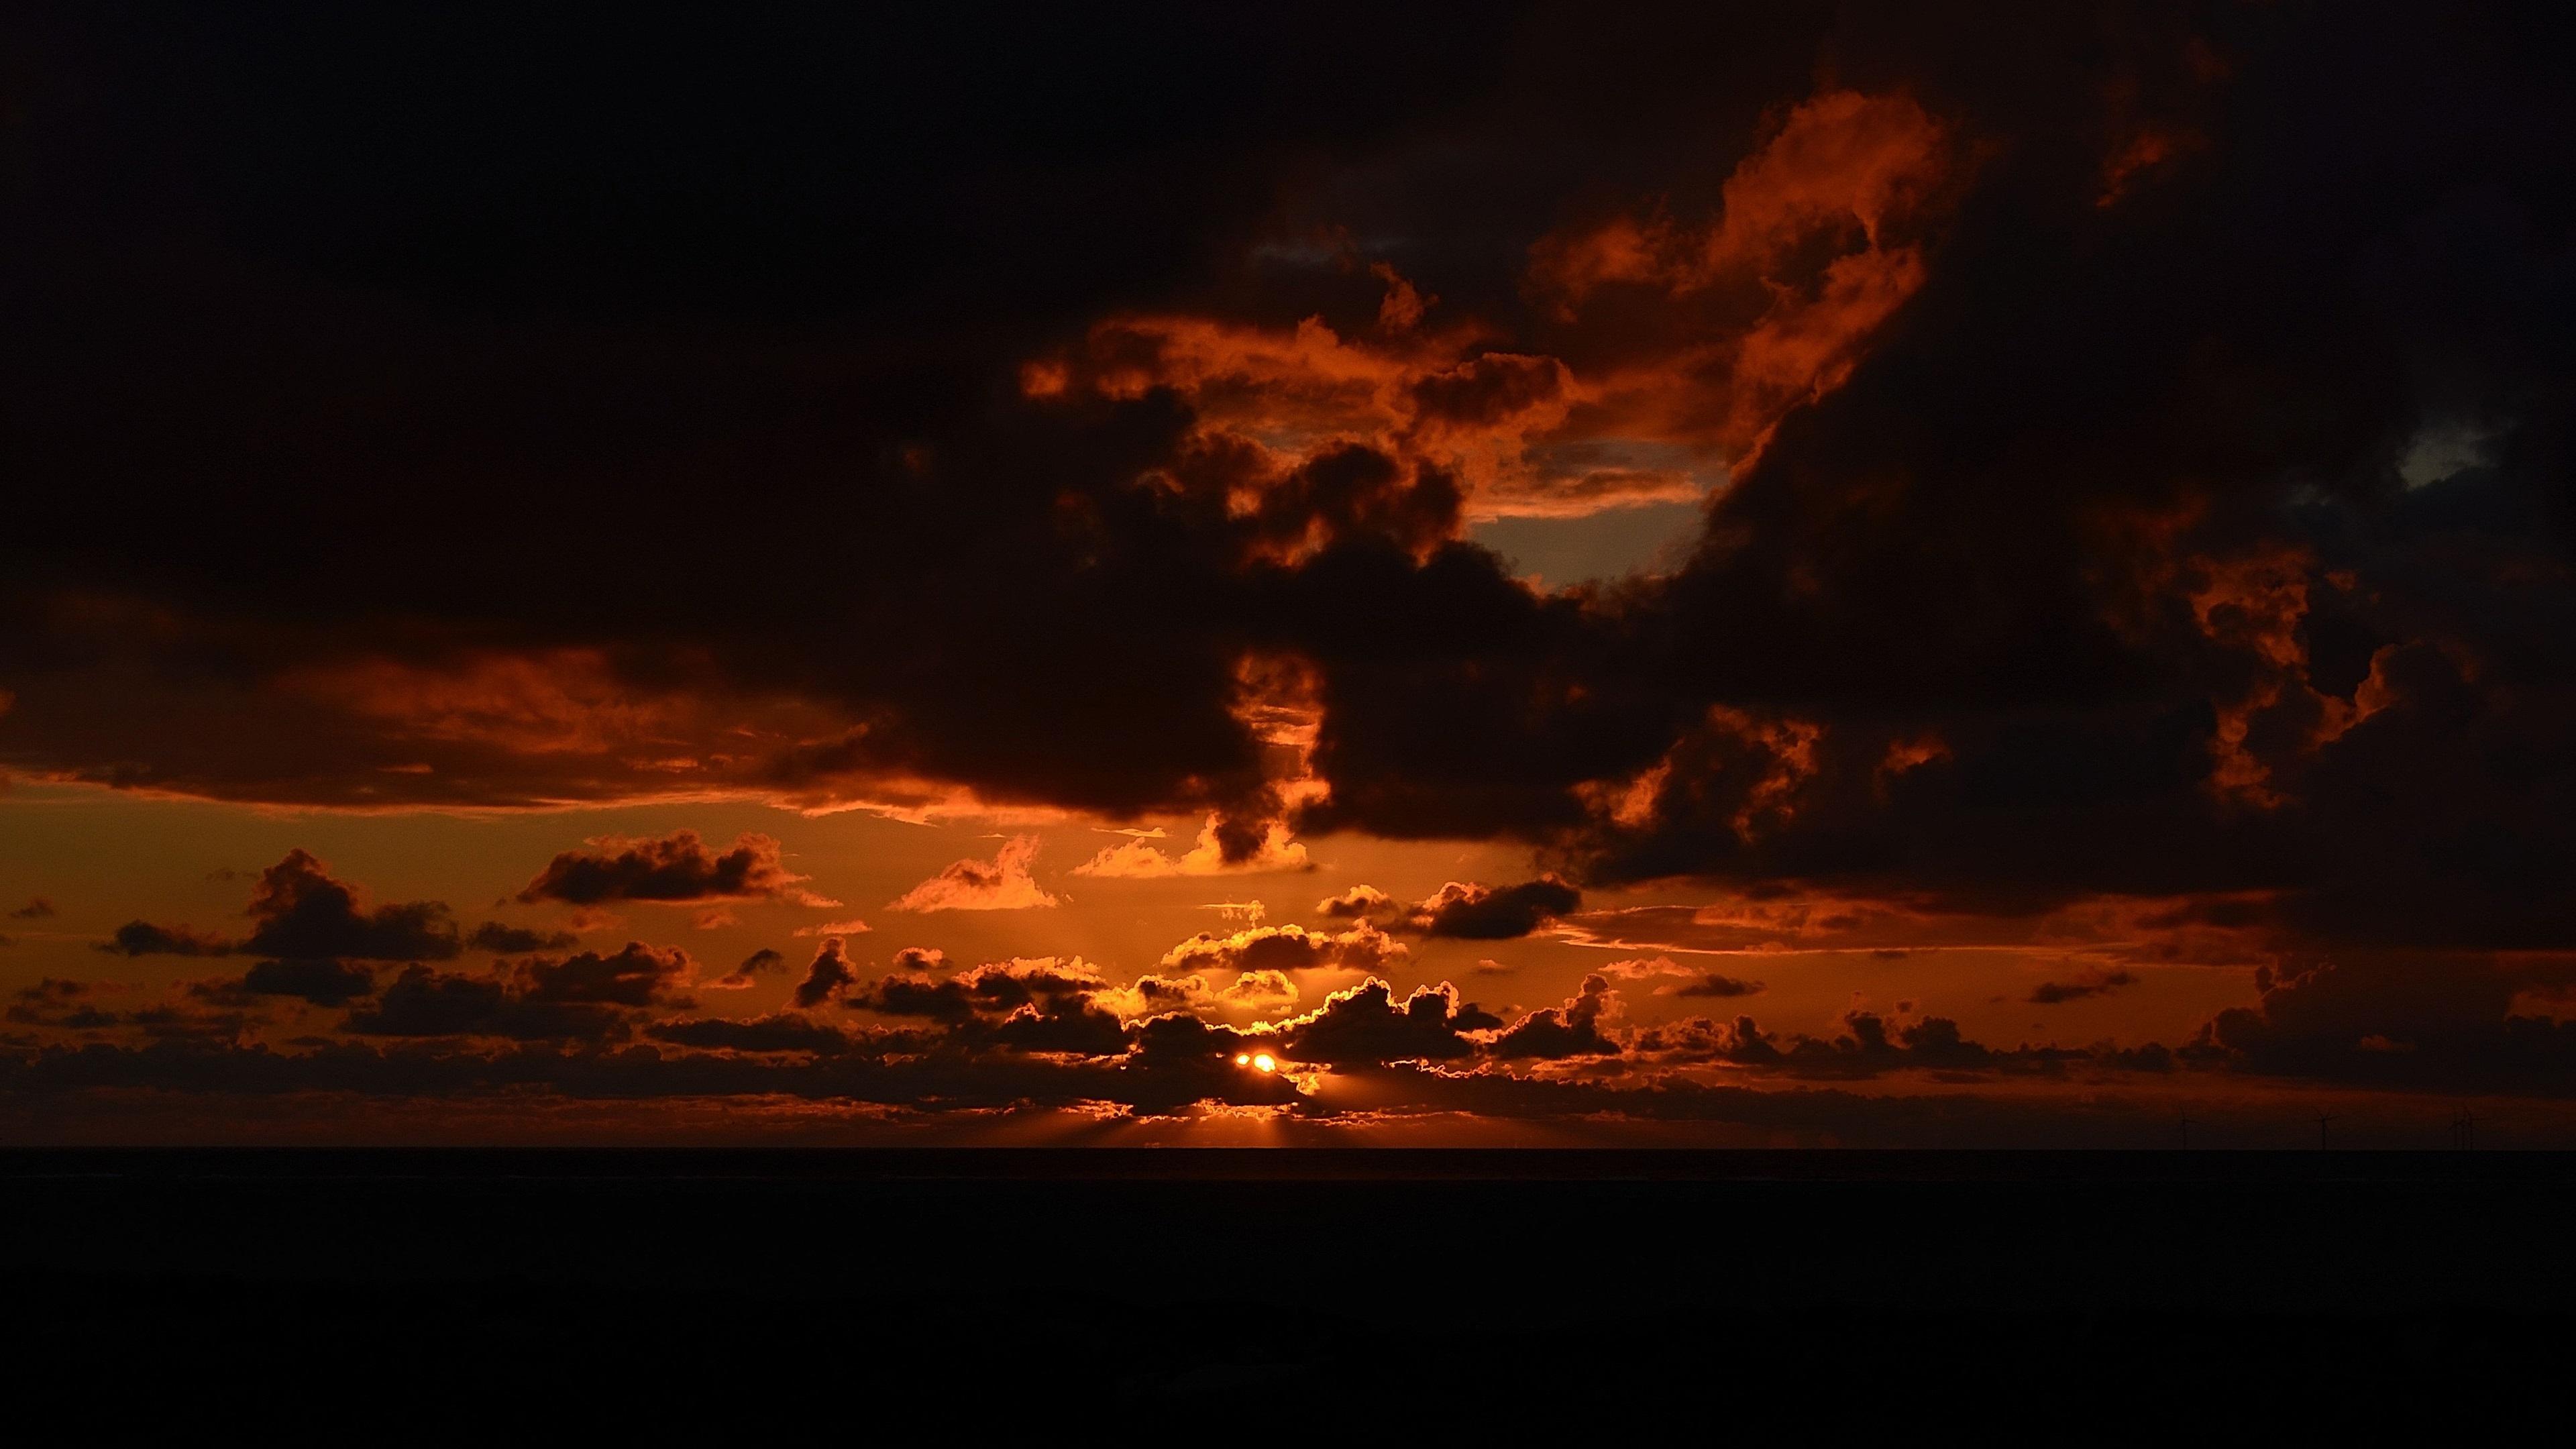 Wallpaper Sunset Clouds Sky Sun Dusk 3840x2160 Uhd 4k Picture